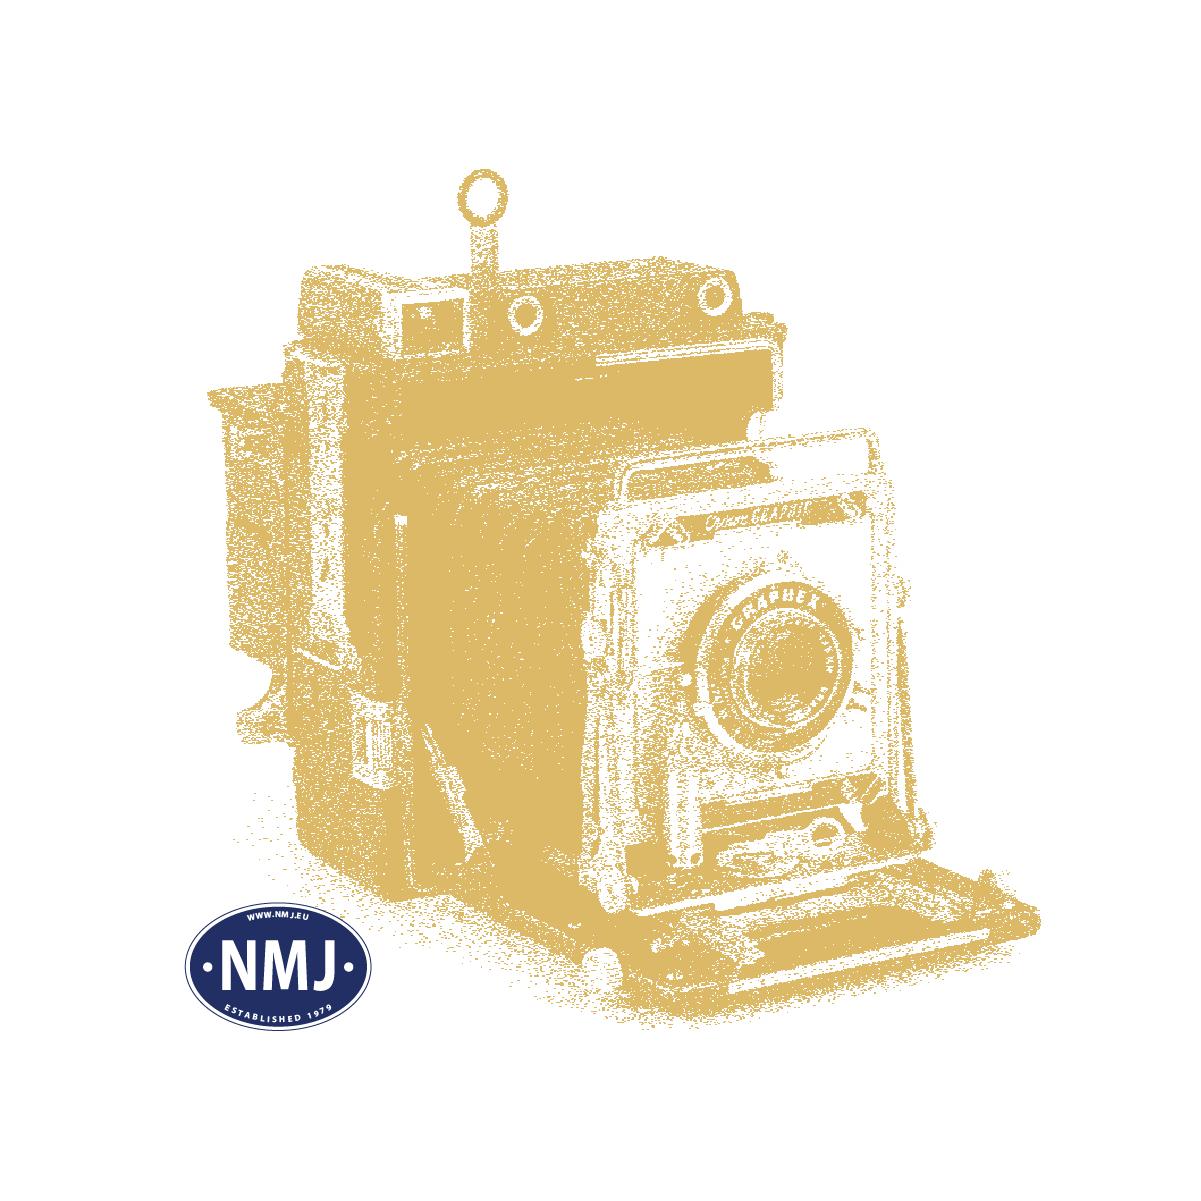 NMJT245001 - NMJ Topline NSB Di3b 641 Gammeldesign, 0-Skala, DCC m/Lyd